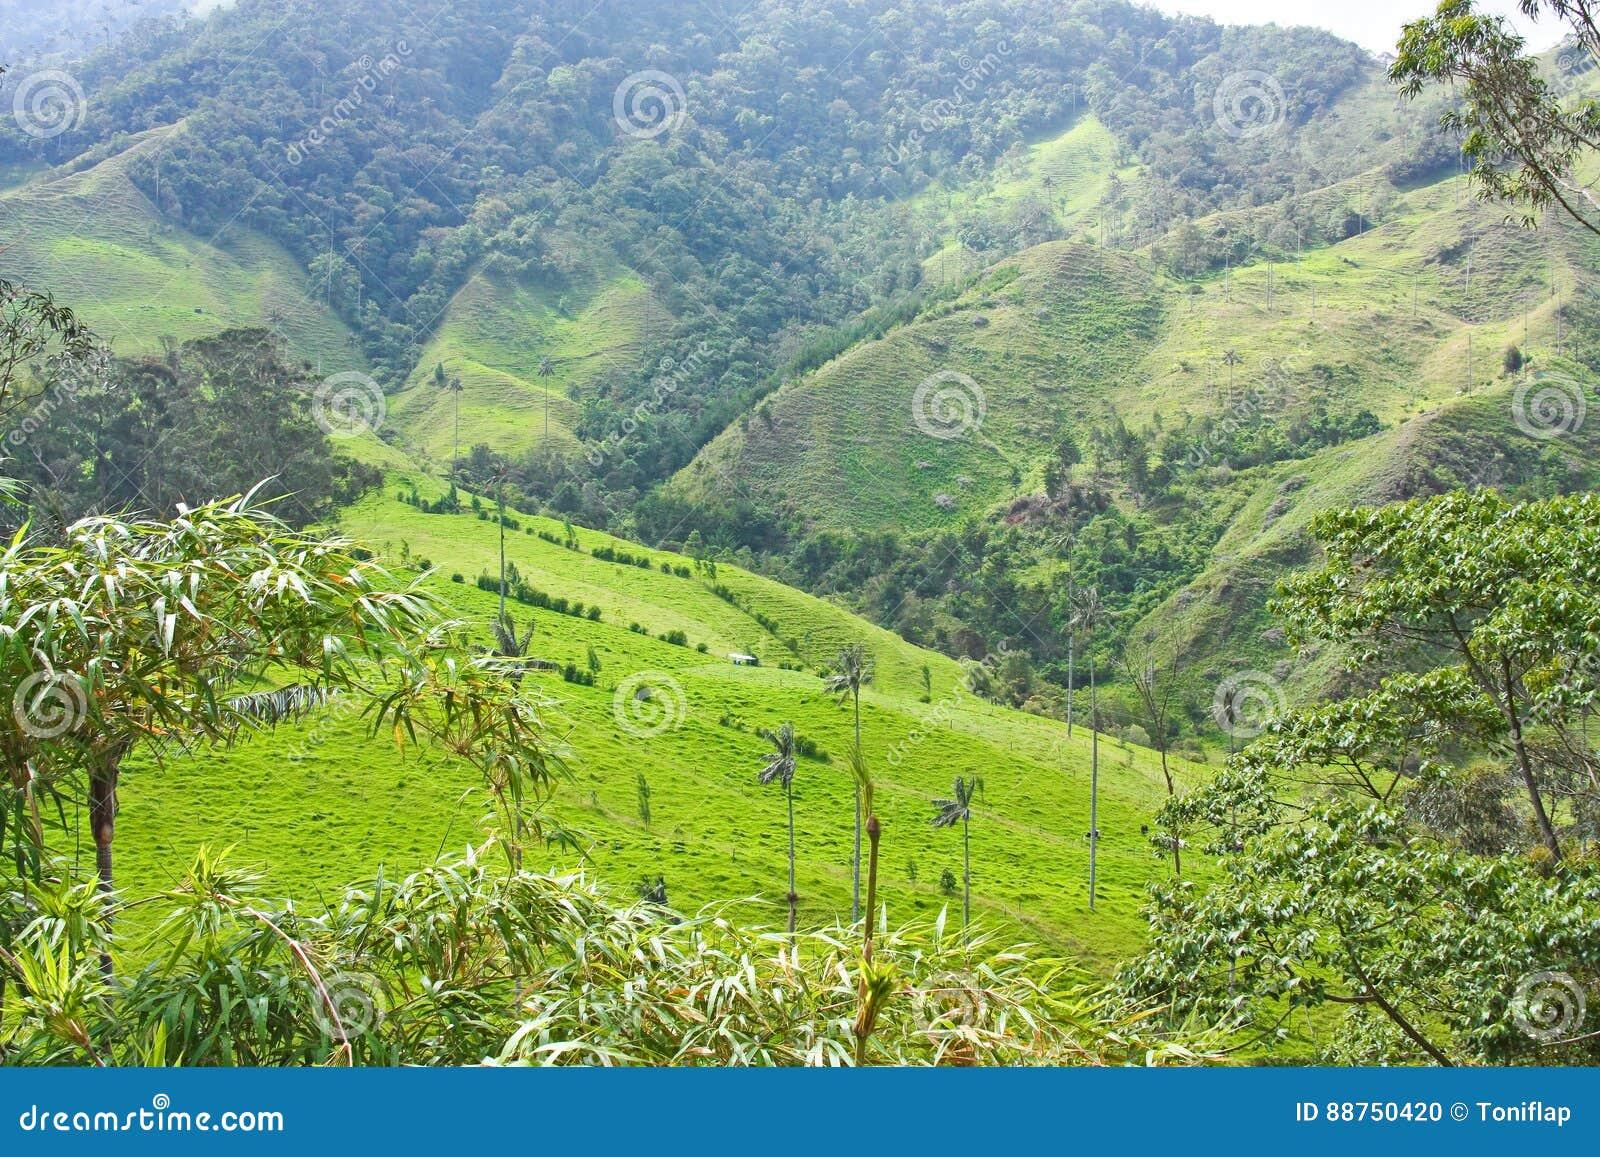 Landskapet i den Cocora dalen med vaxet gömma i handflatan, mellan mountaen